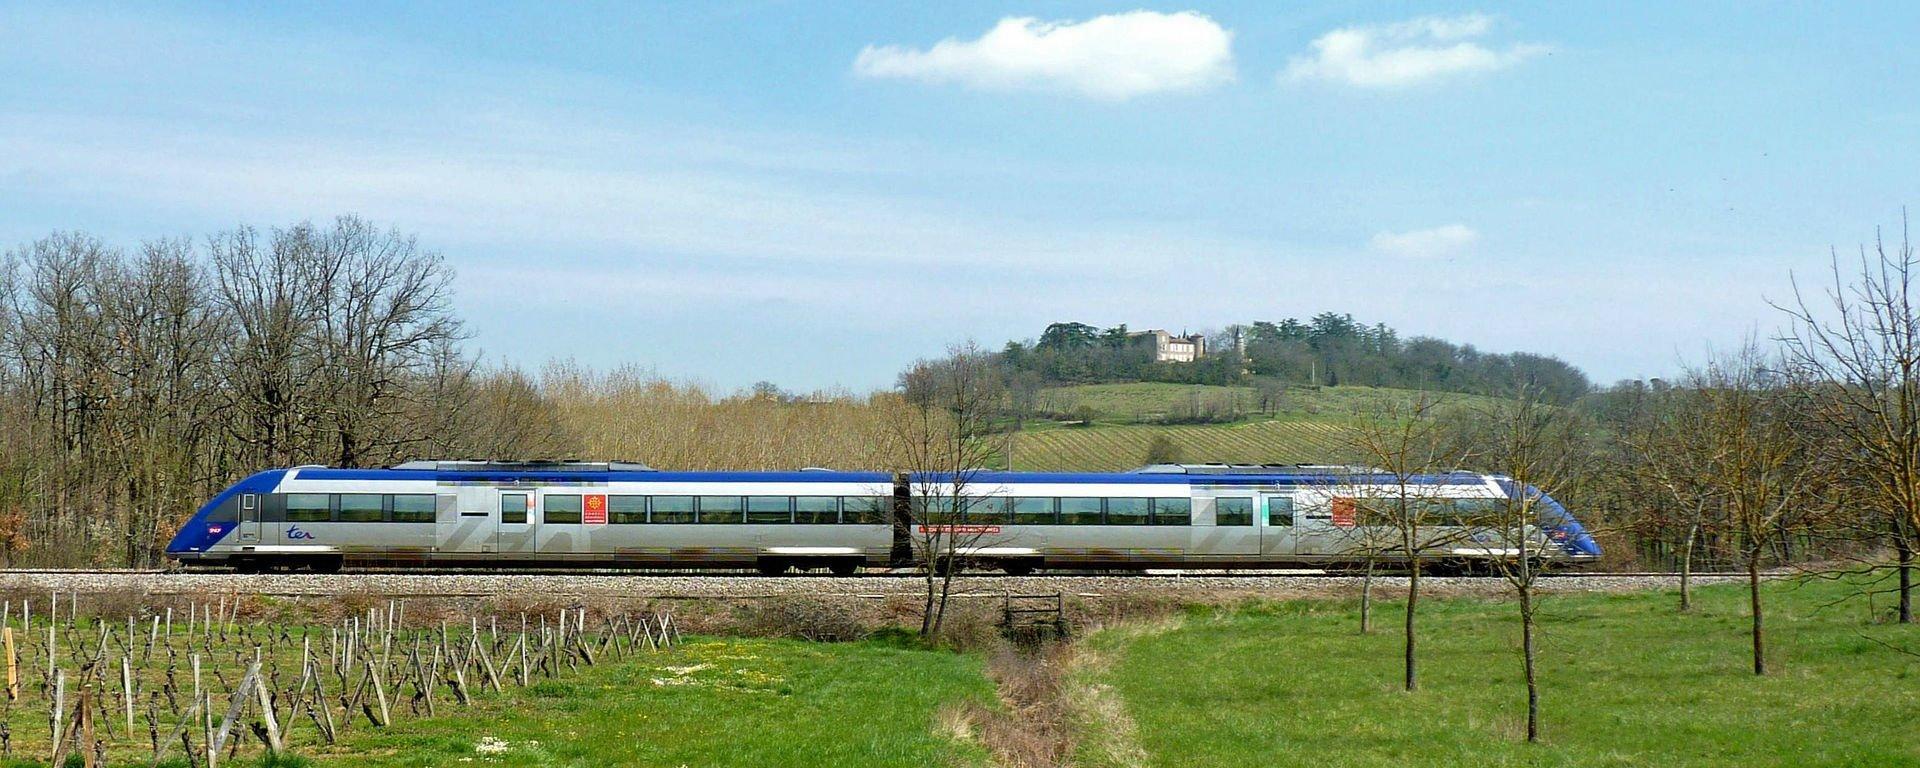 Trains en vallée du Rhône